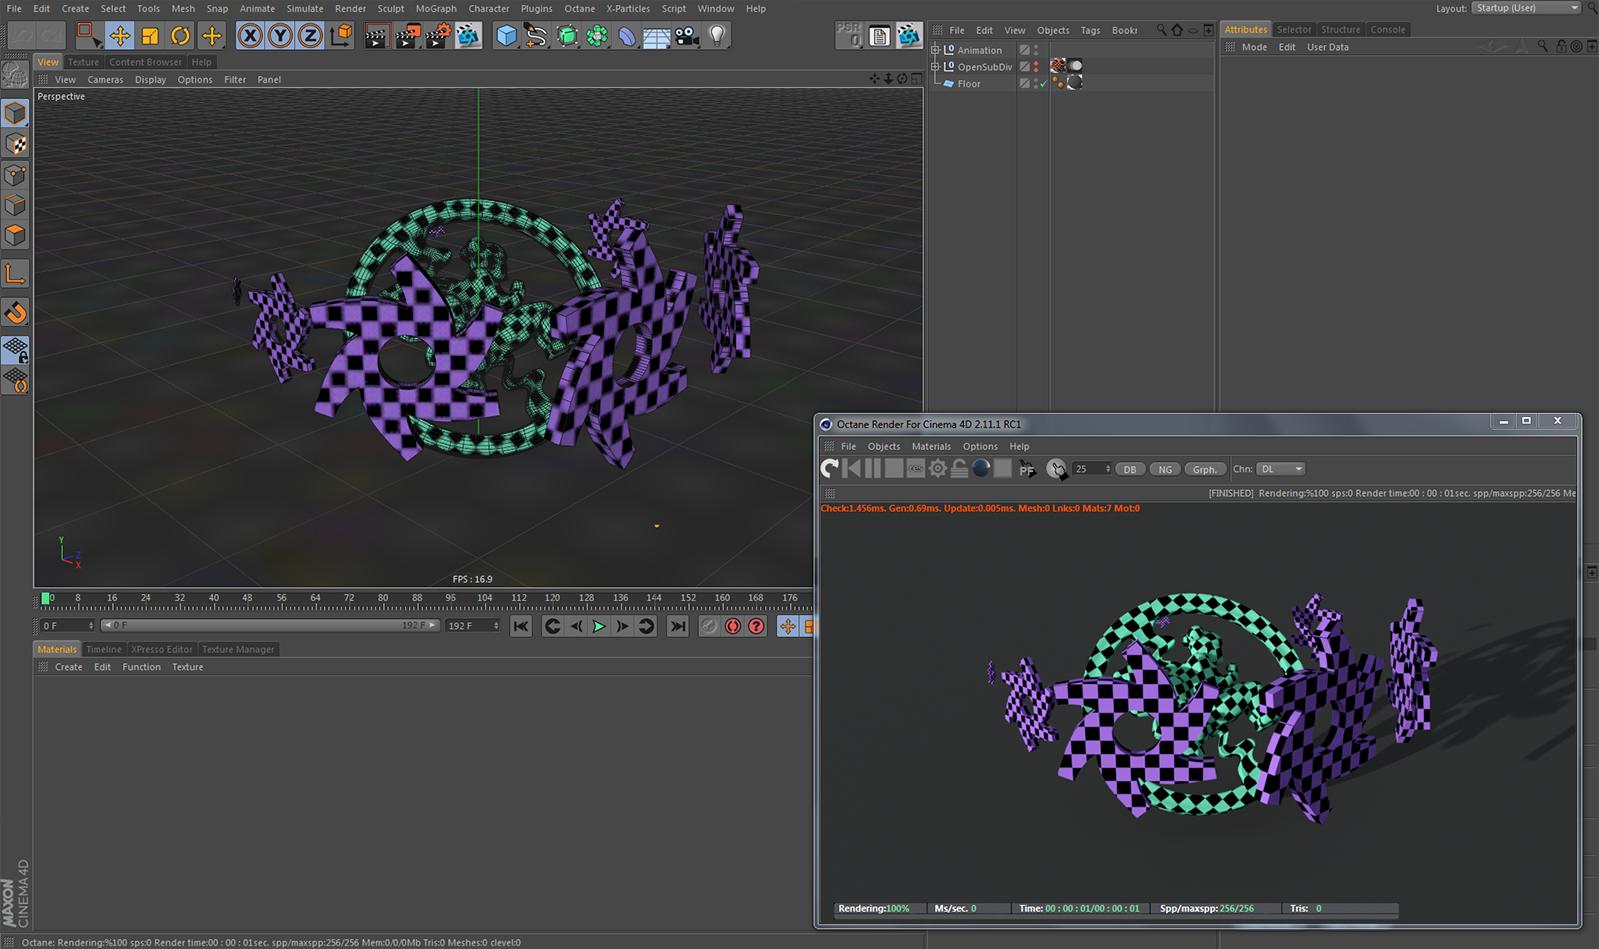 Octane渲染器基础全面C4D教程Understanding Octane Renderer for Cinema 4D